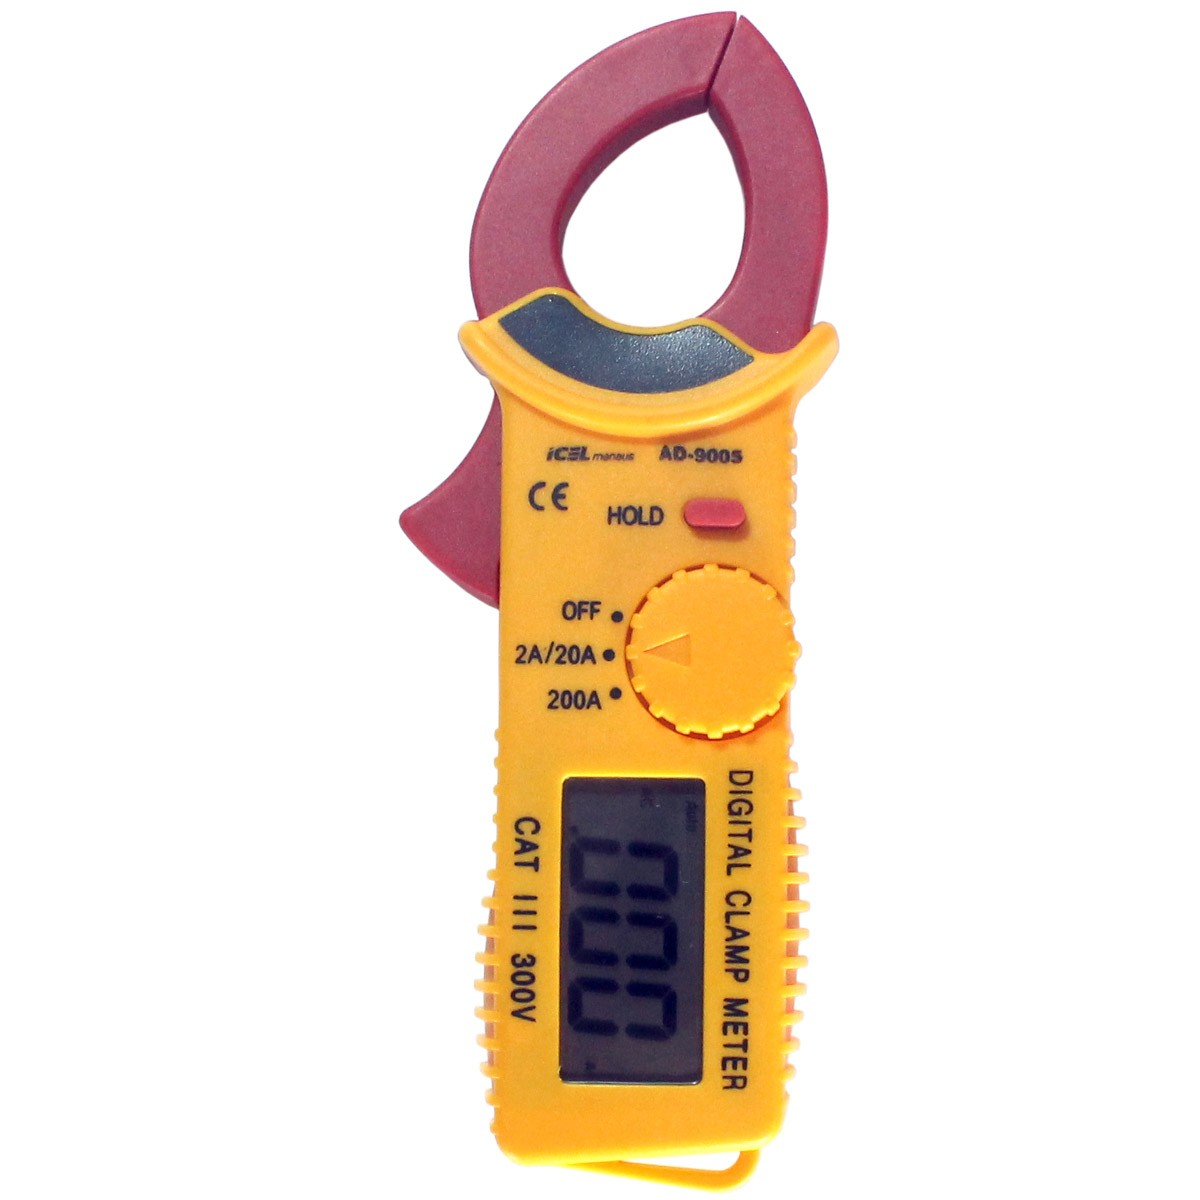 AD9005 - Mini Alicate Digital Icel Corrente AC: 200A  - Rio Link